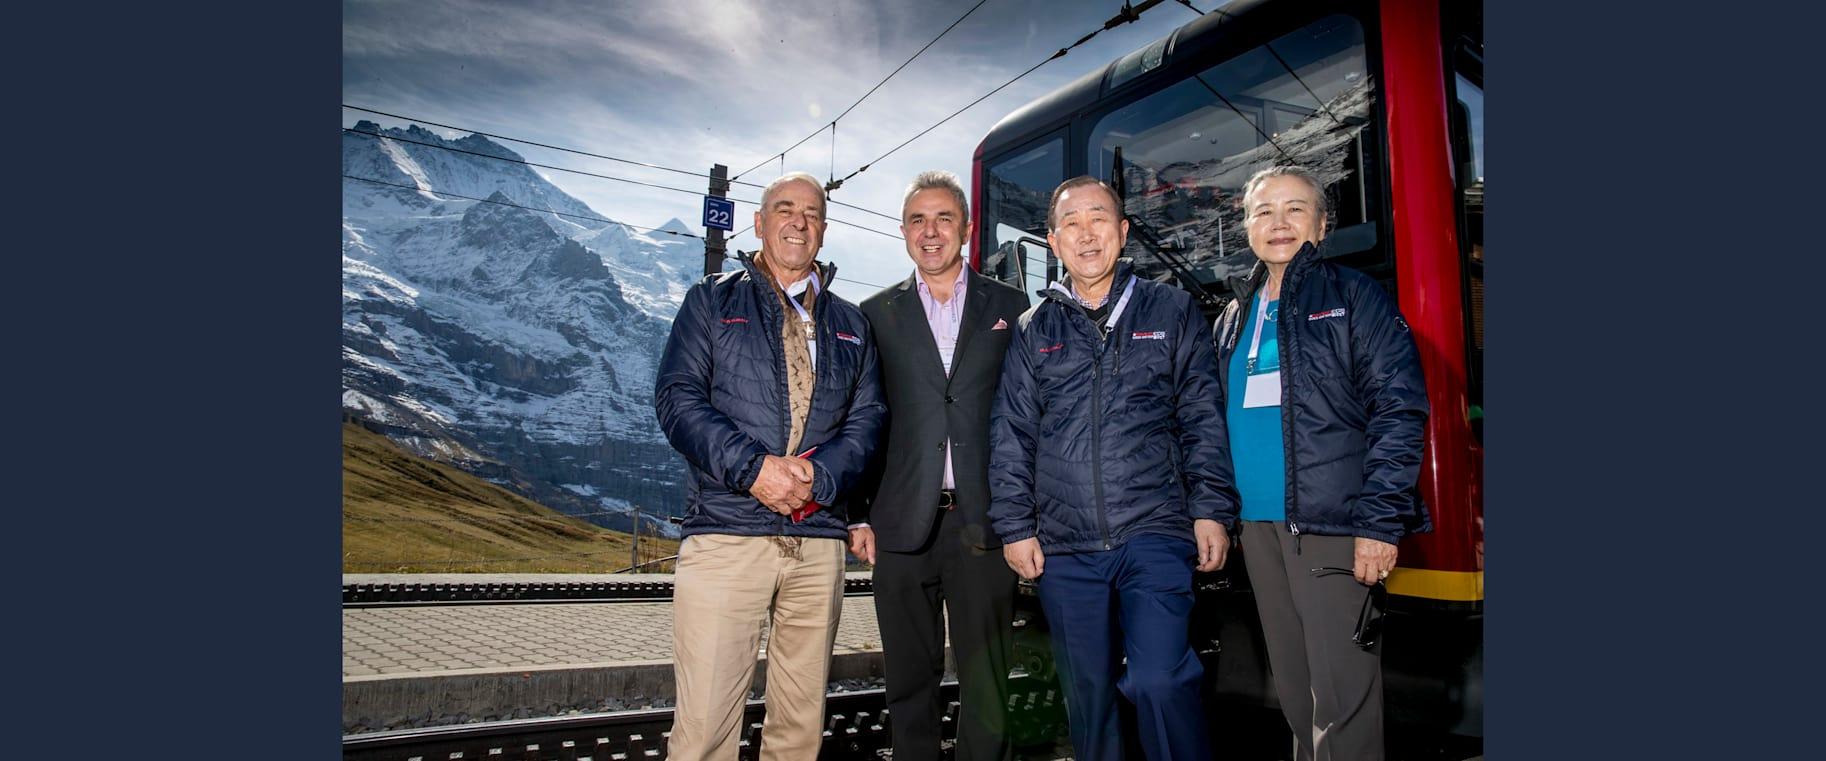 Adolf Ogi Urs Kessler Ban Ki moon mit Ehefrau Yoo Soon taek Jungfraubahn Kleine Scheidegg